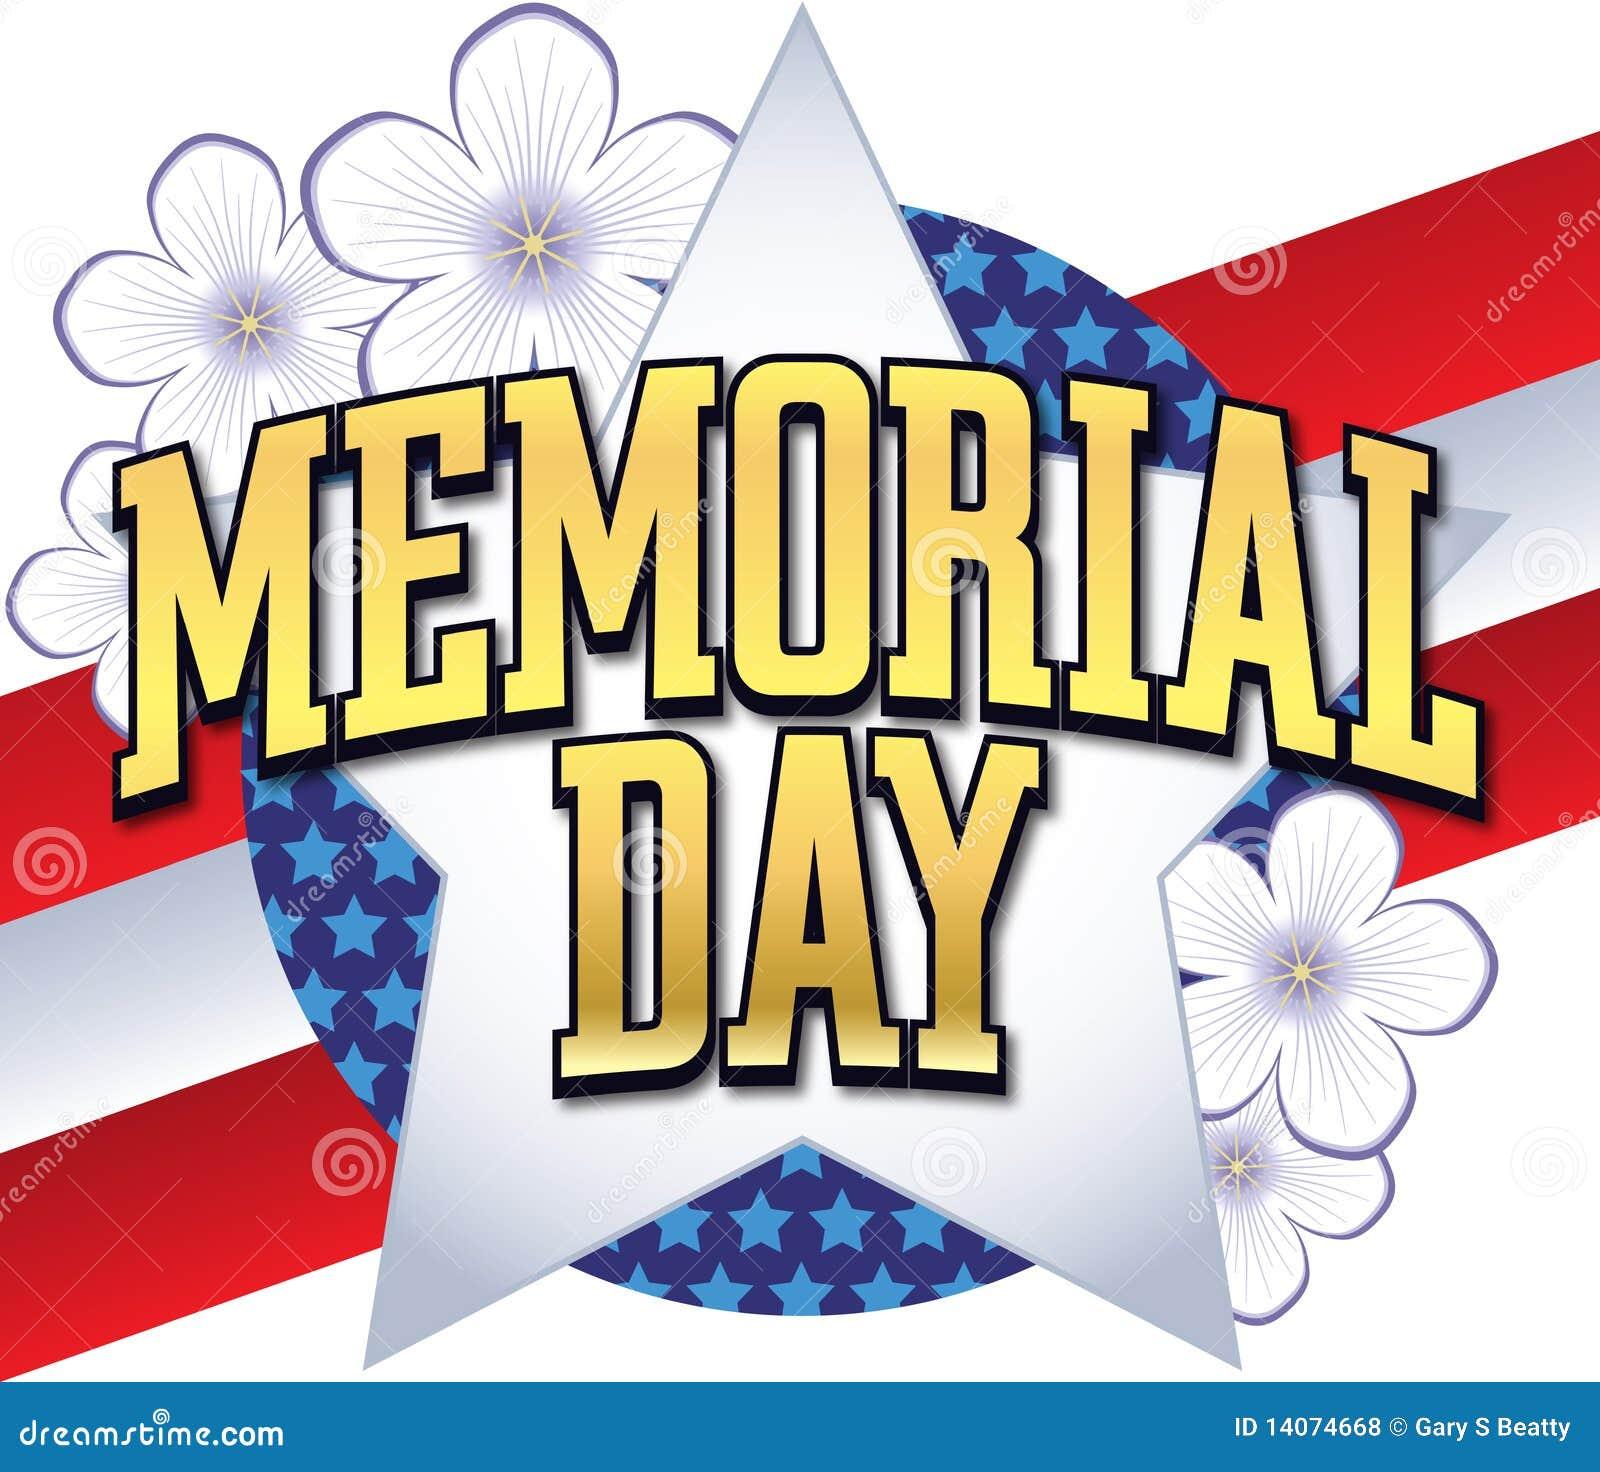 Memorial Day Logo Type Royalty Free Stock Photos - Image: 14074668